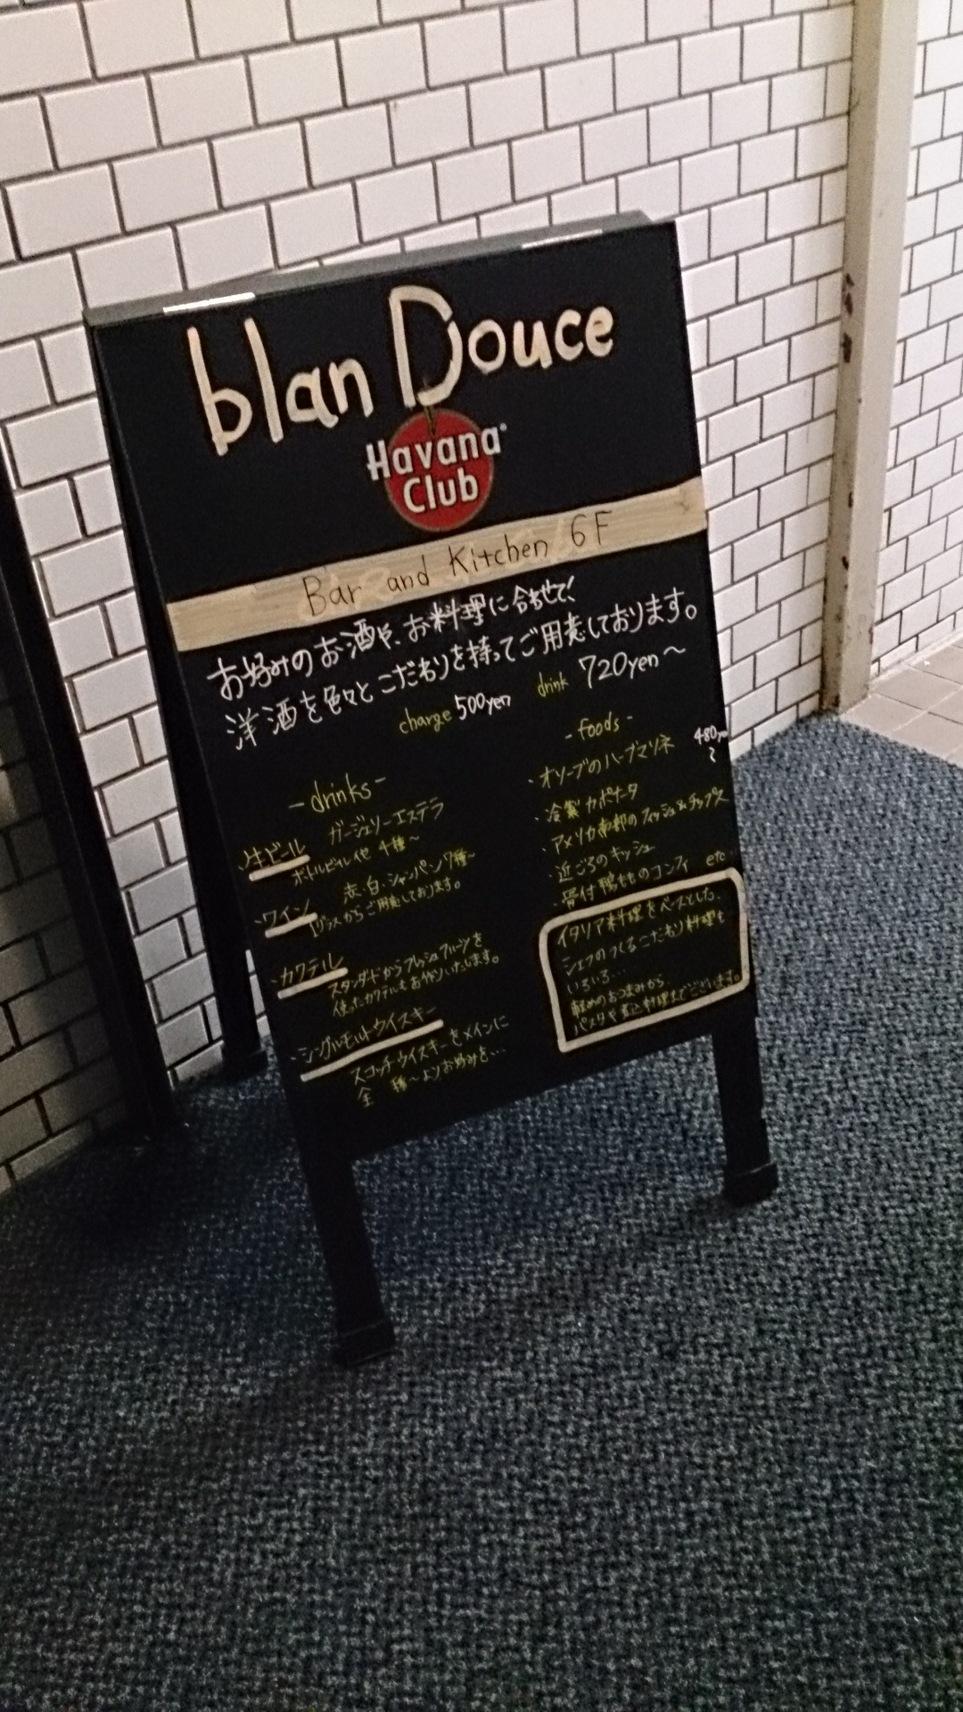 blanDouce bar&kitchen